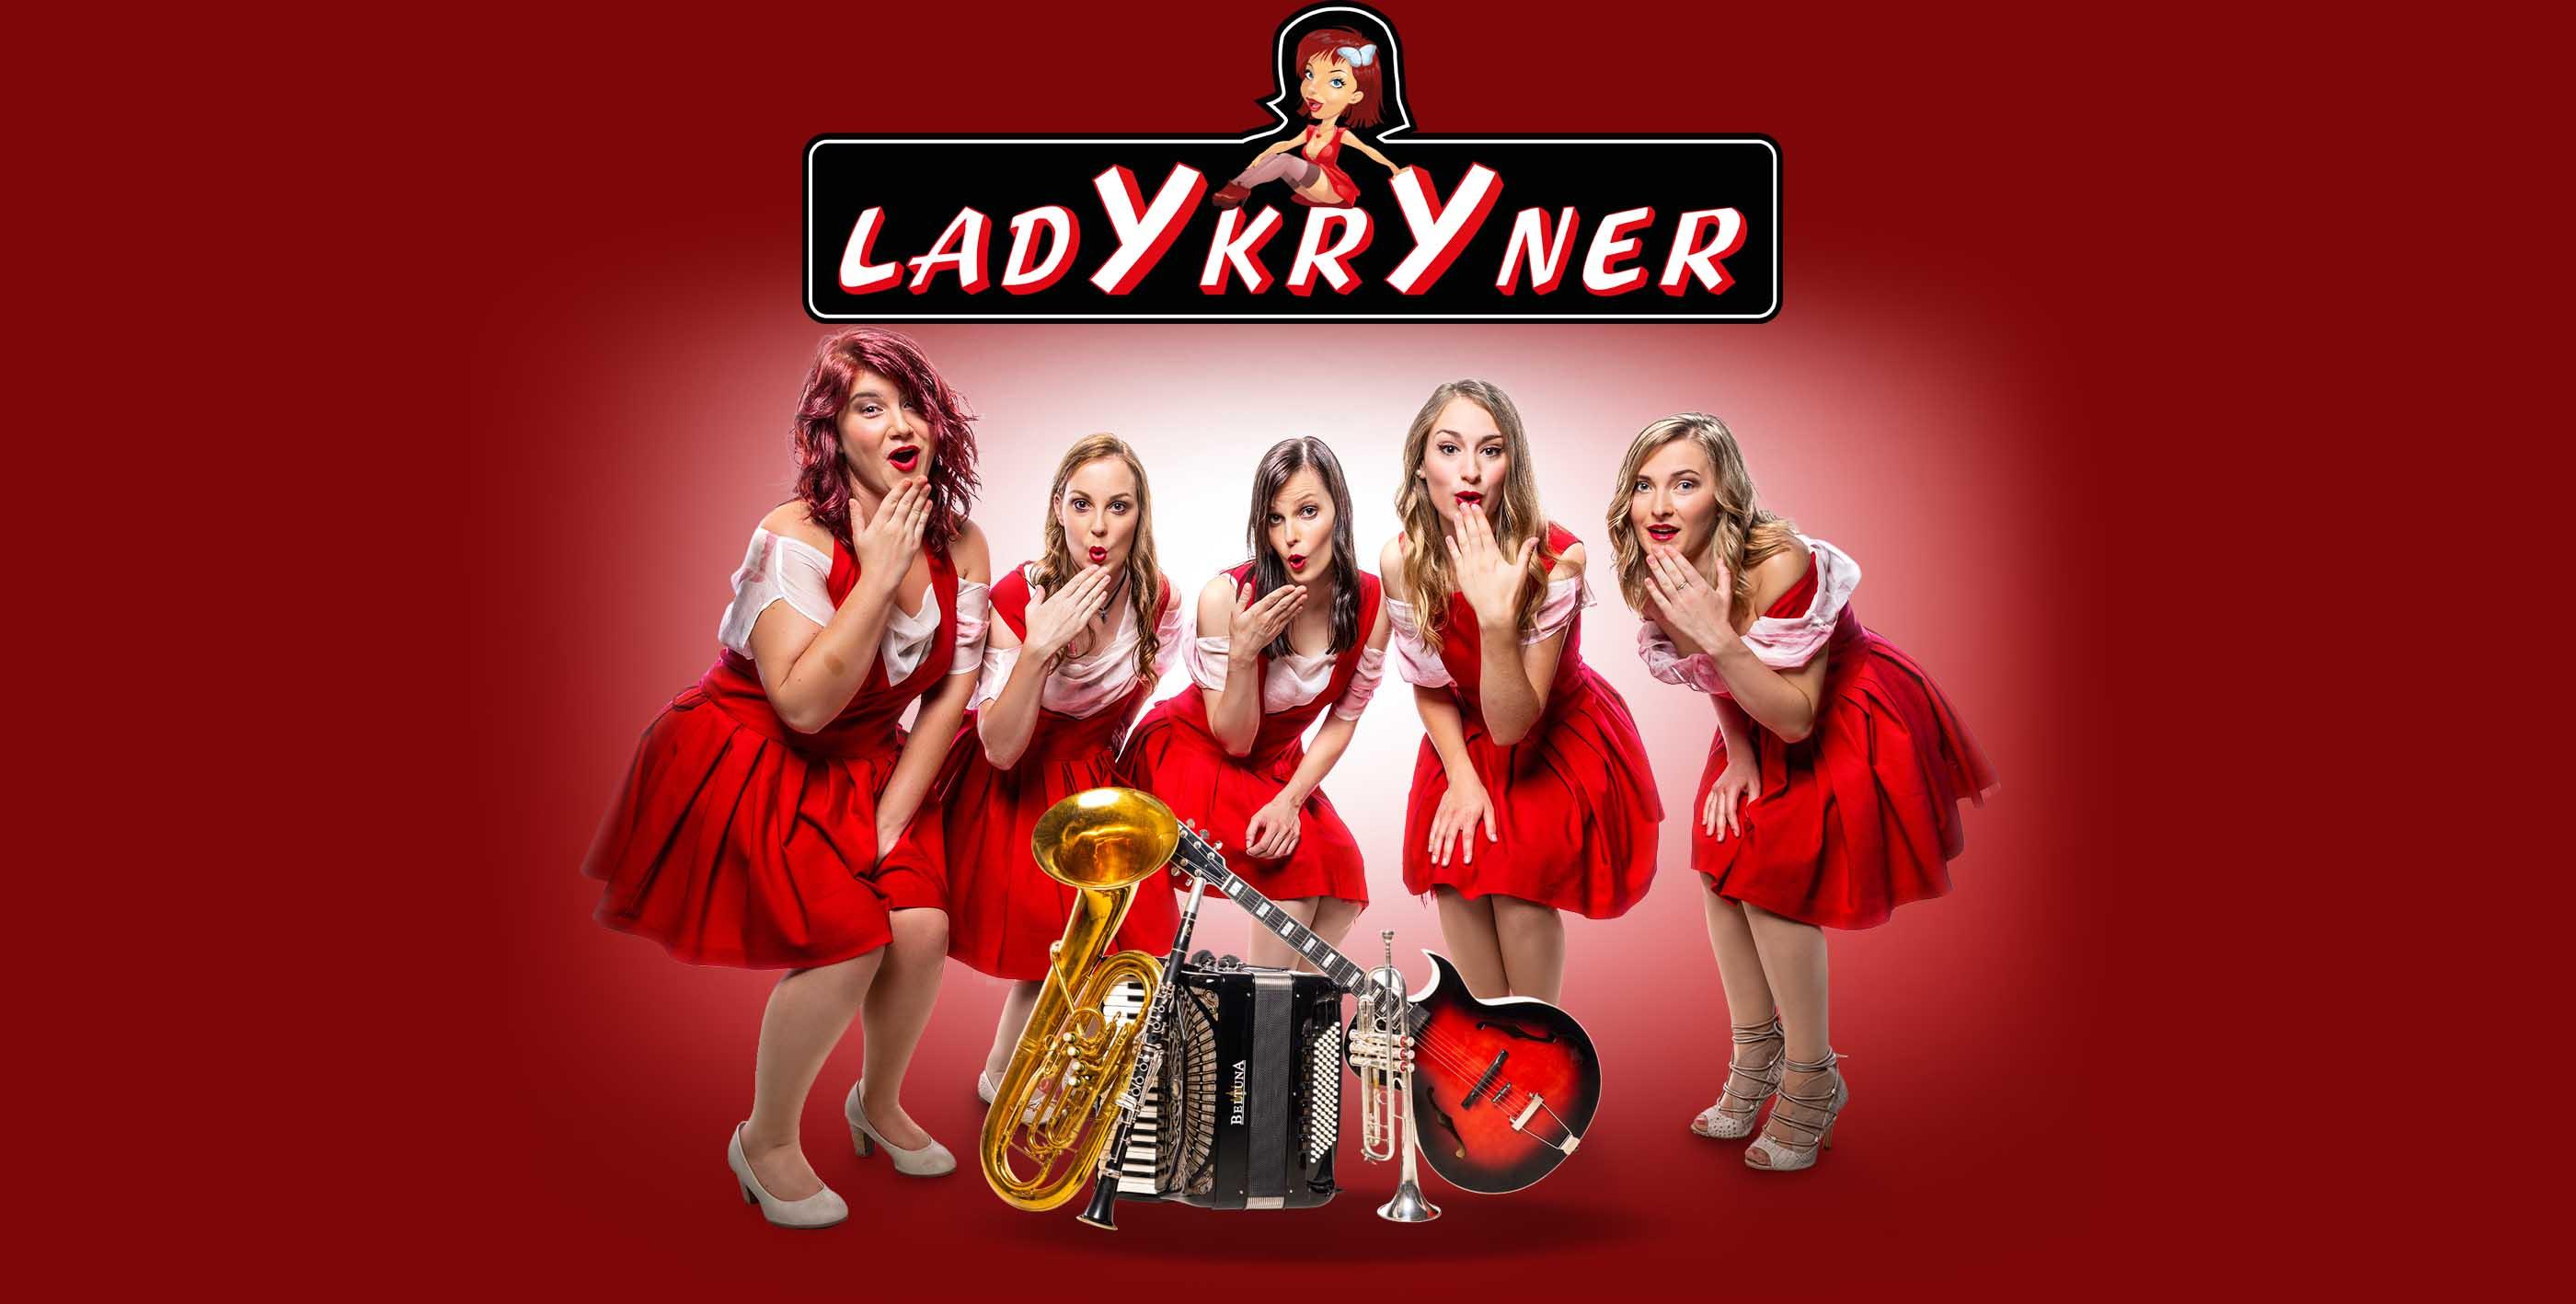 Ladykryner